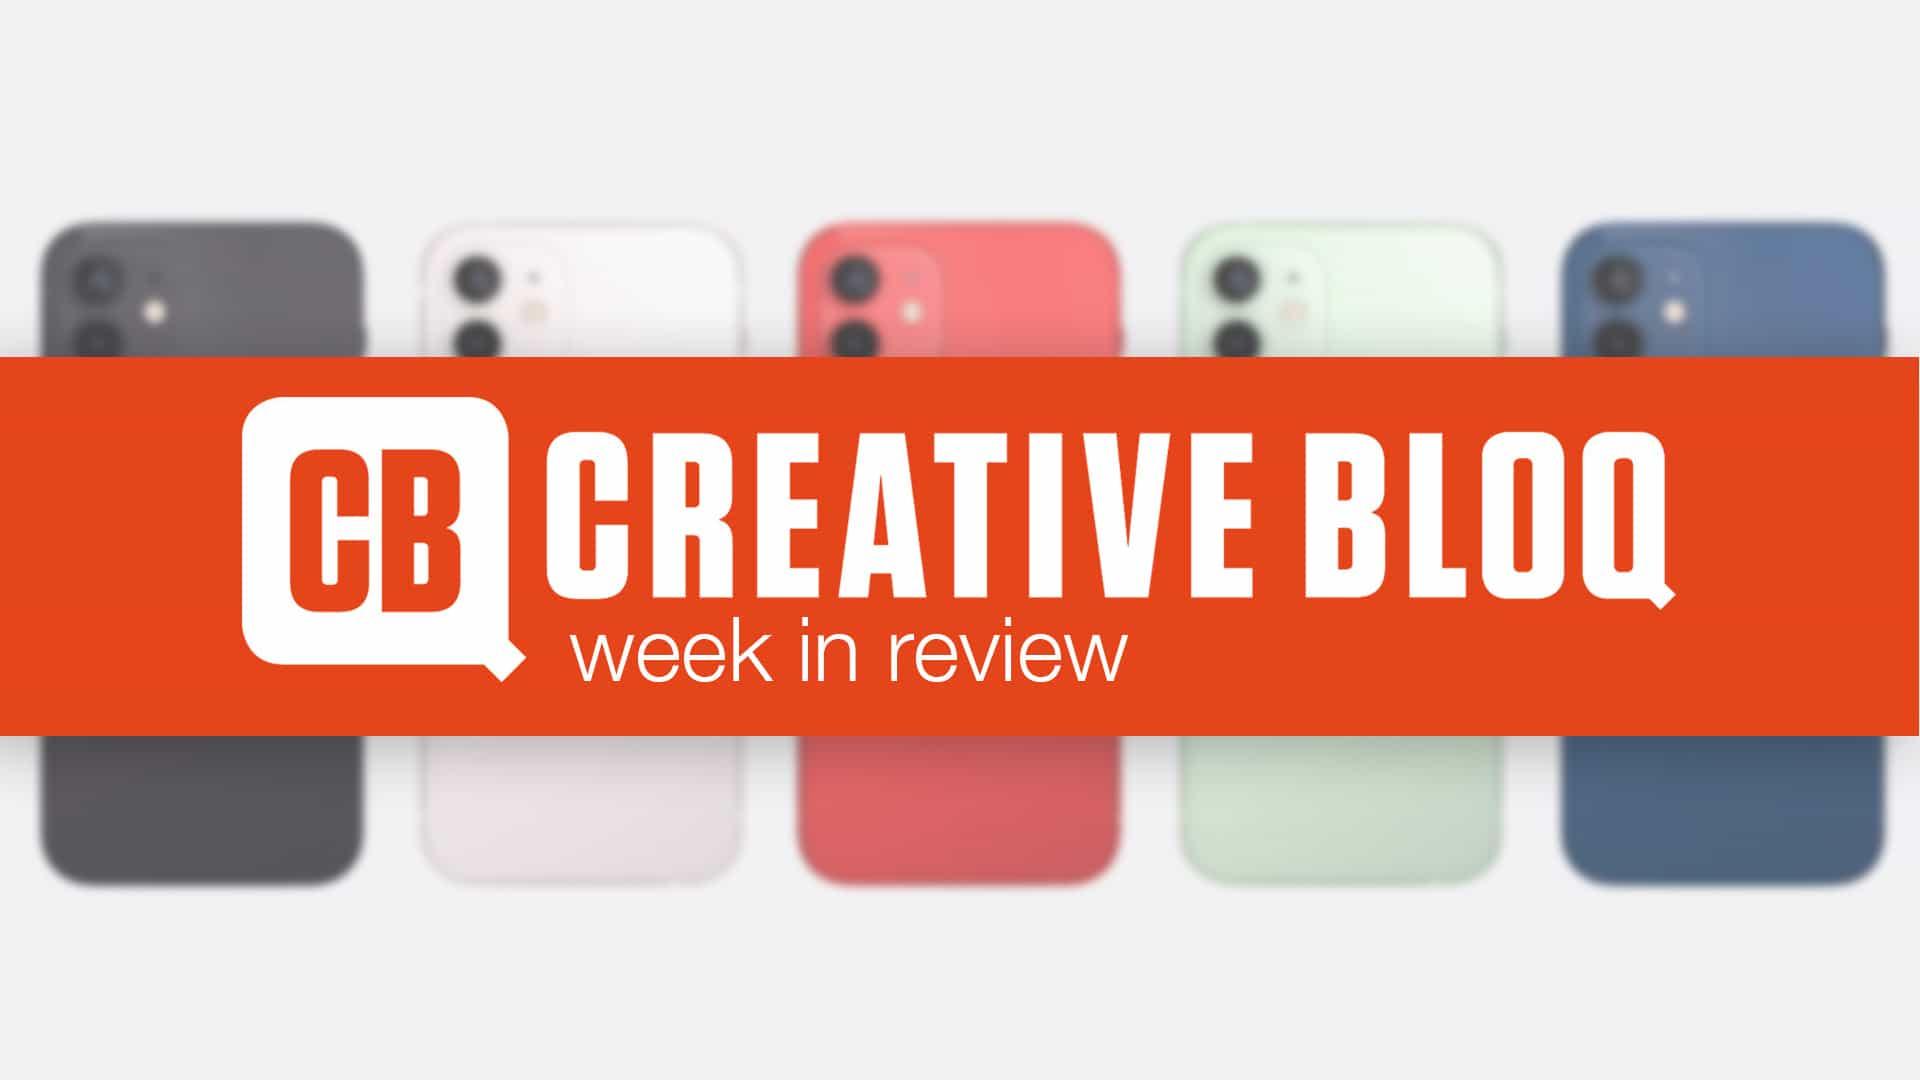 Nuevos iPhones, nuevos iPads, nuevos iMacs, nuevos iOS: Hola, Apple se filtra